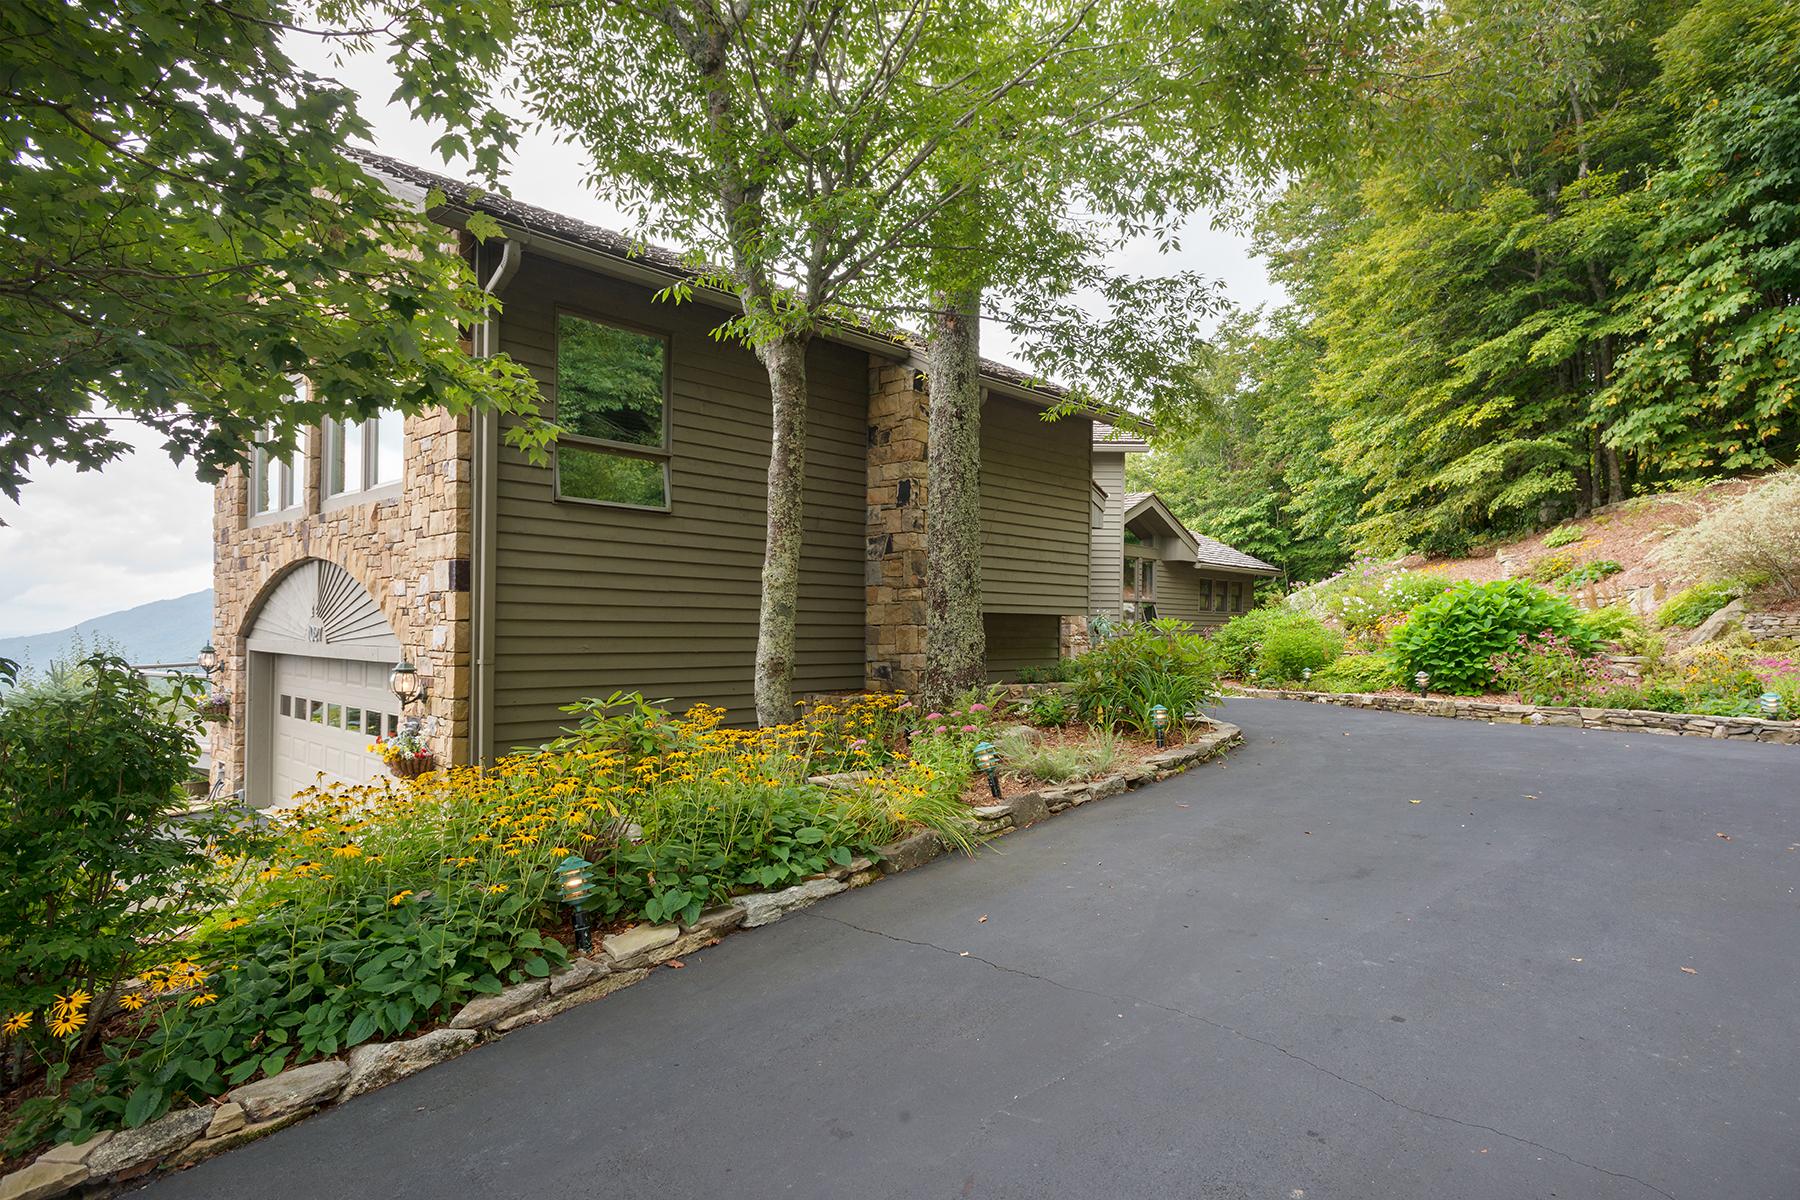 Single Family Home for Sale at LINVILLE RIDGE 1027 Ridge Drive Linville, North Carolina, 28646 United States